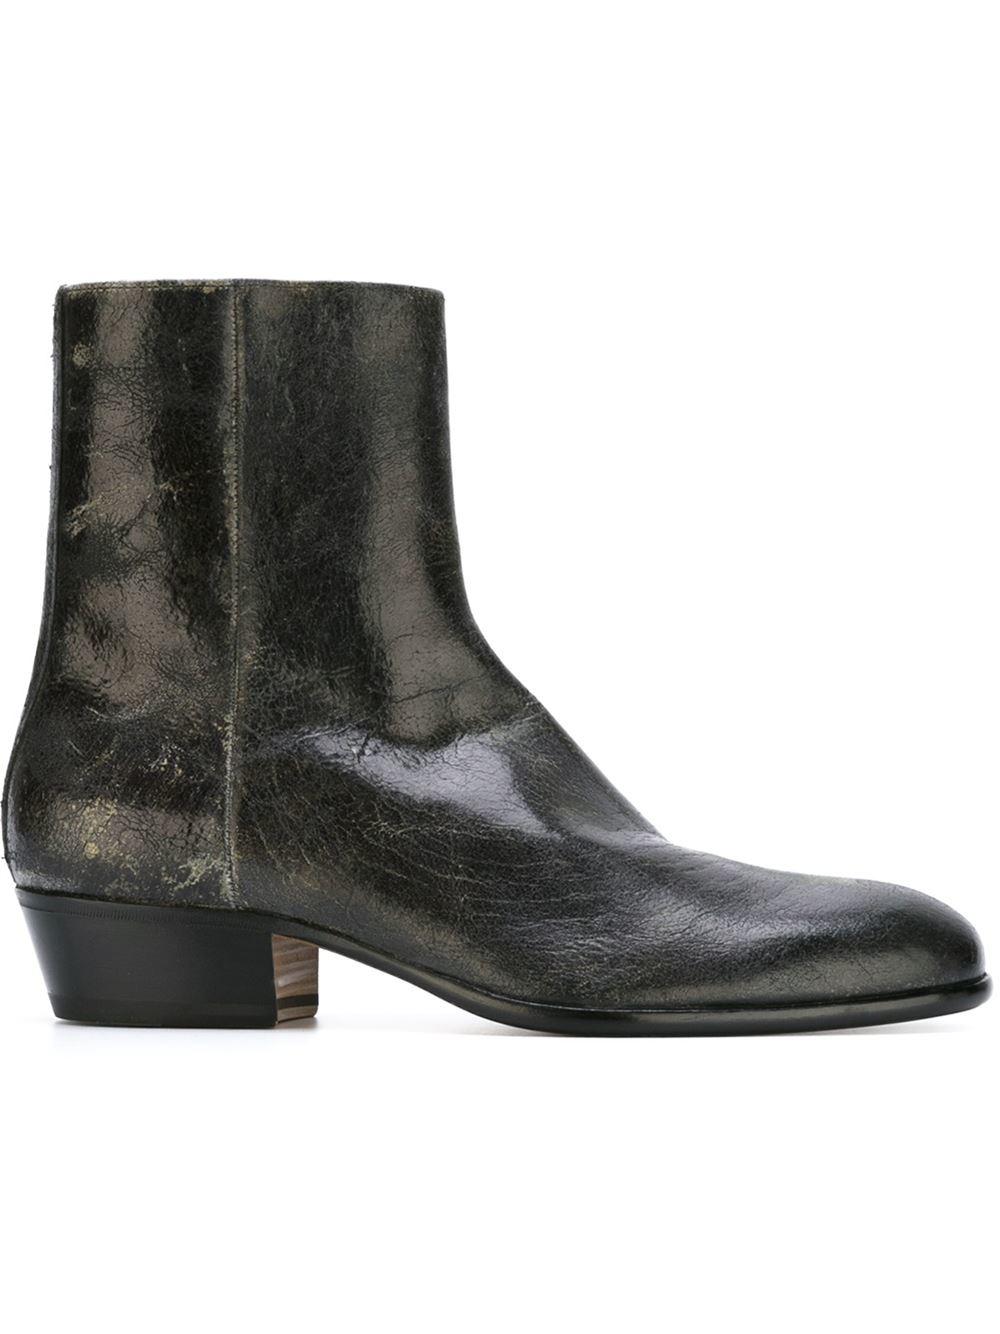 Maison Margiela Leather Cuban Heel